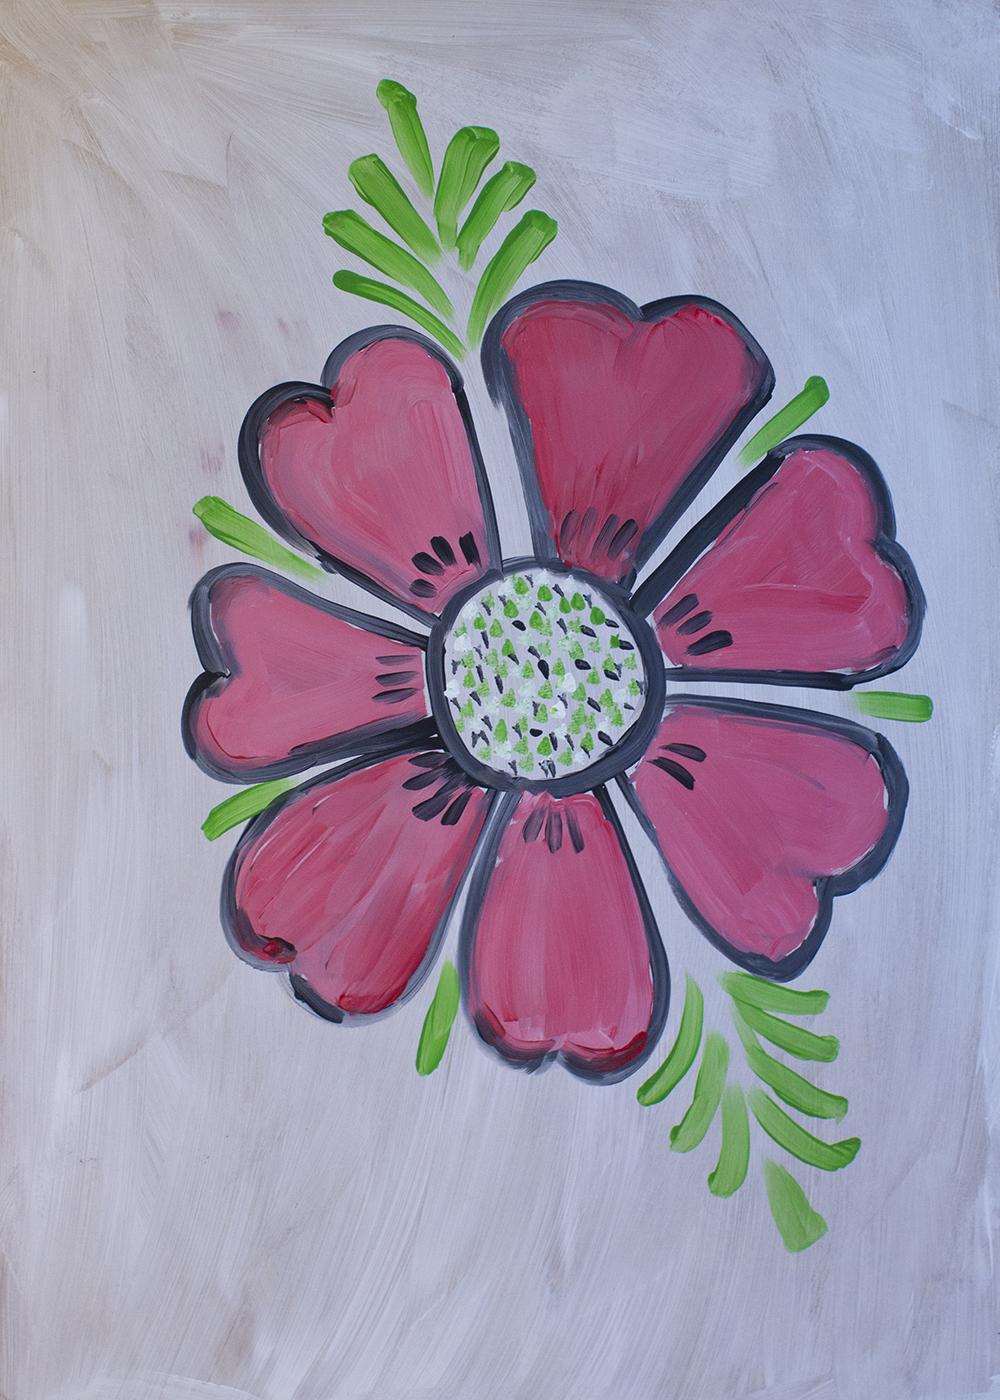 """The love flower of Sudan"" - Wgdan, Sudan, Norway"